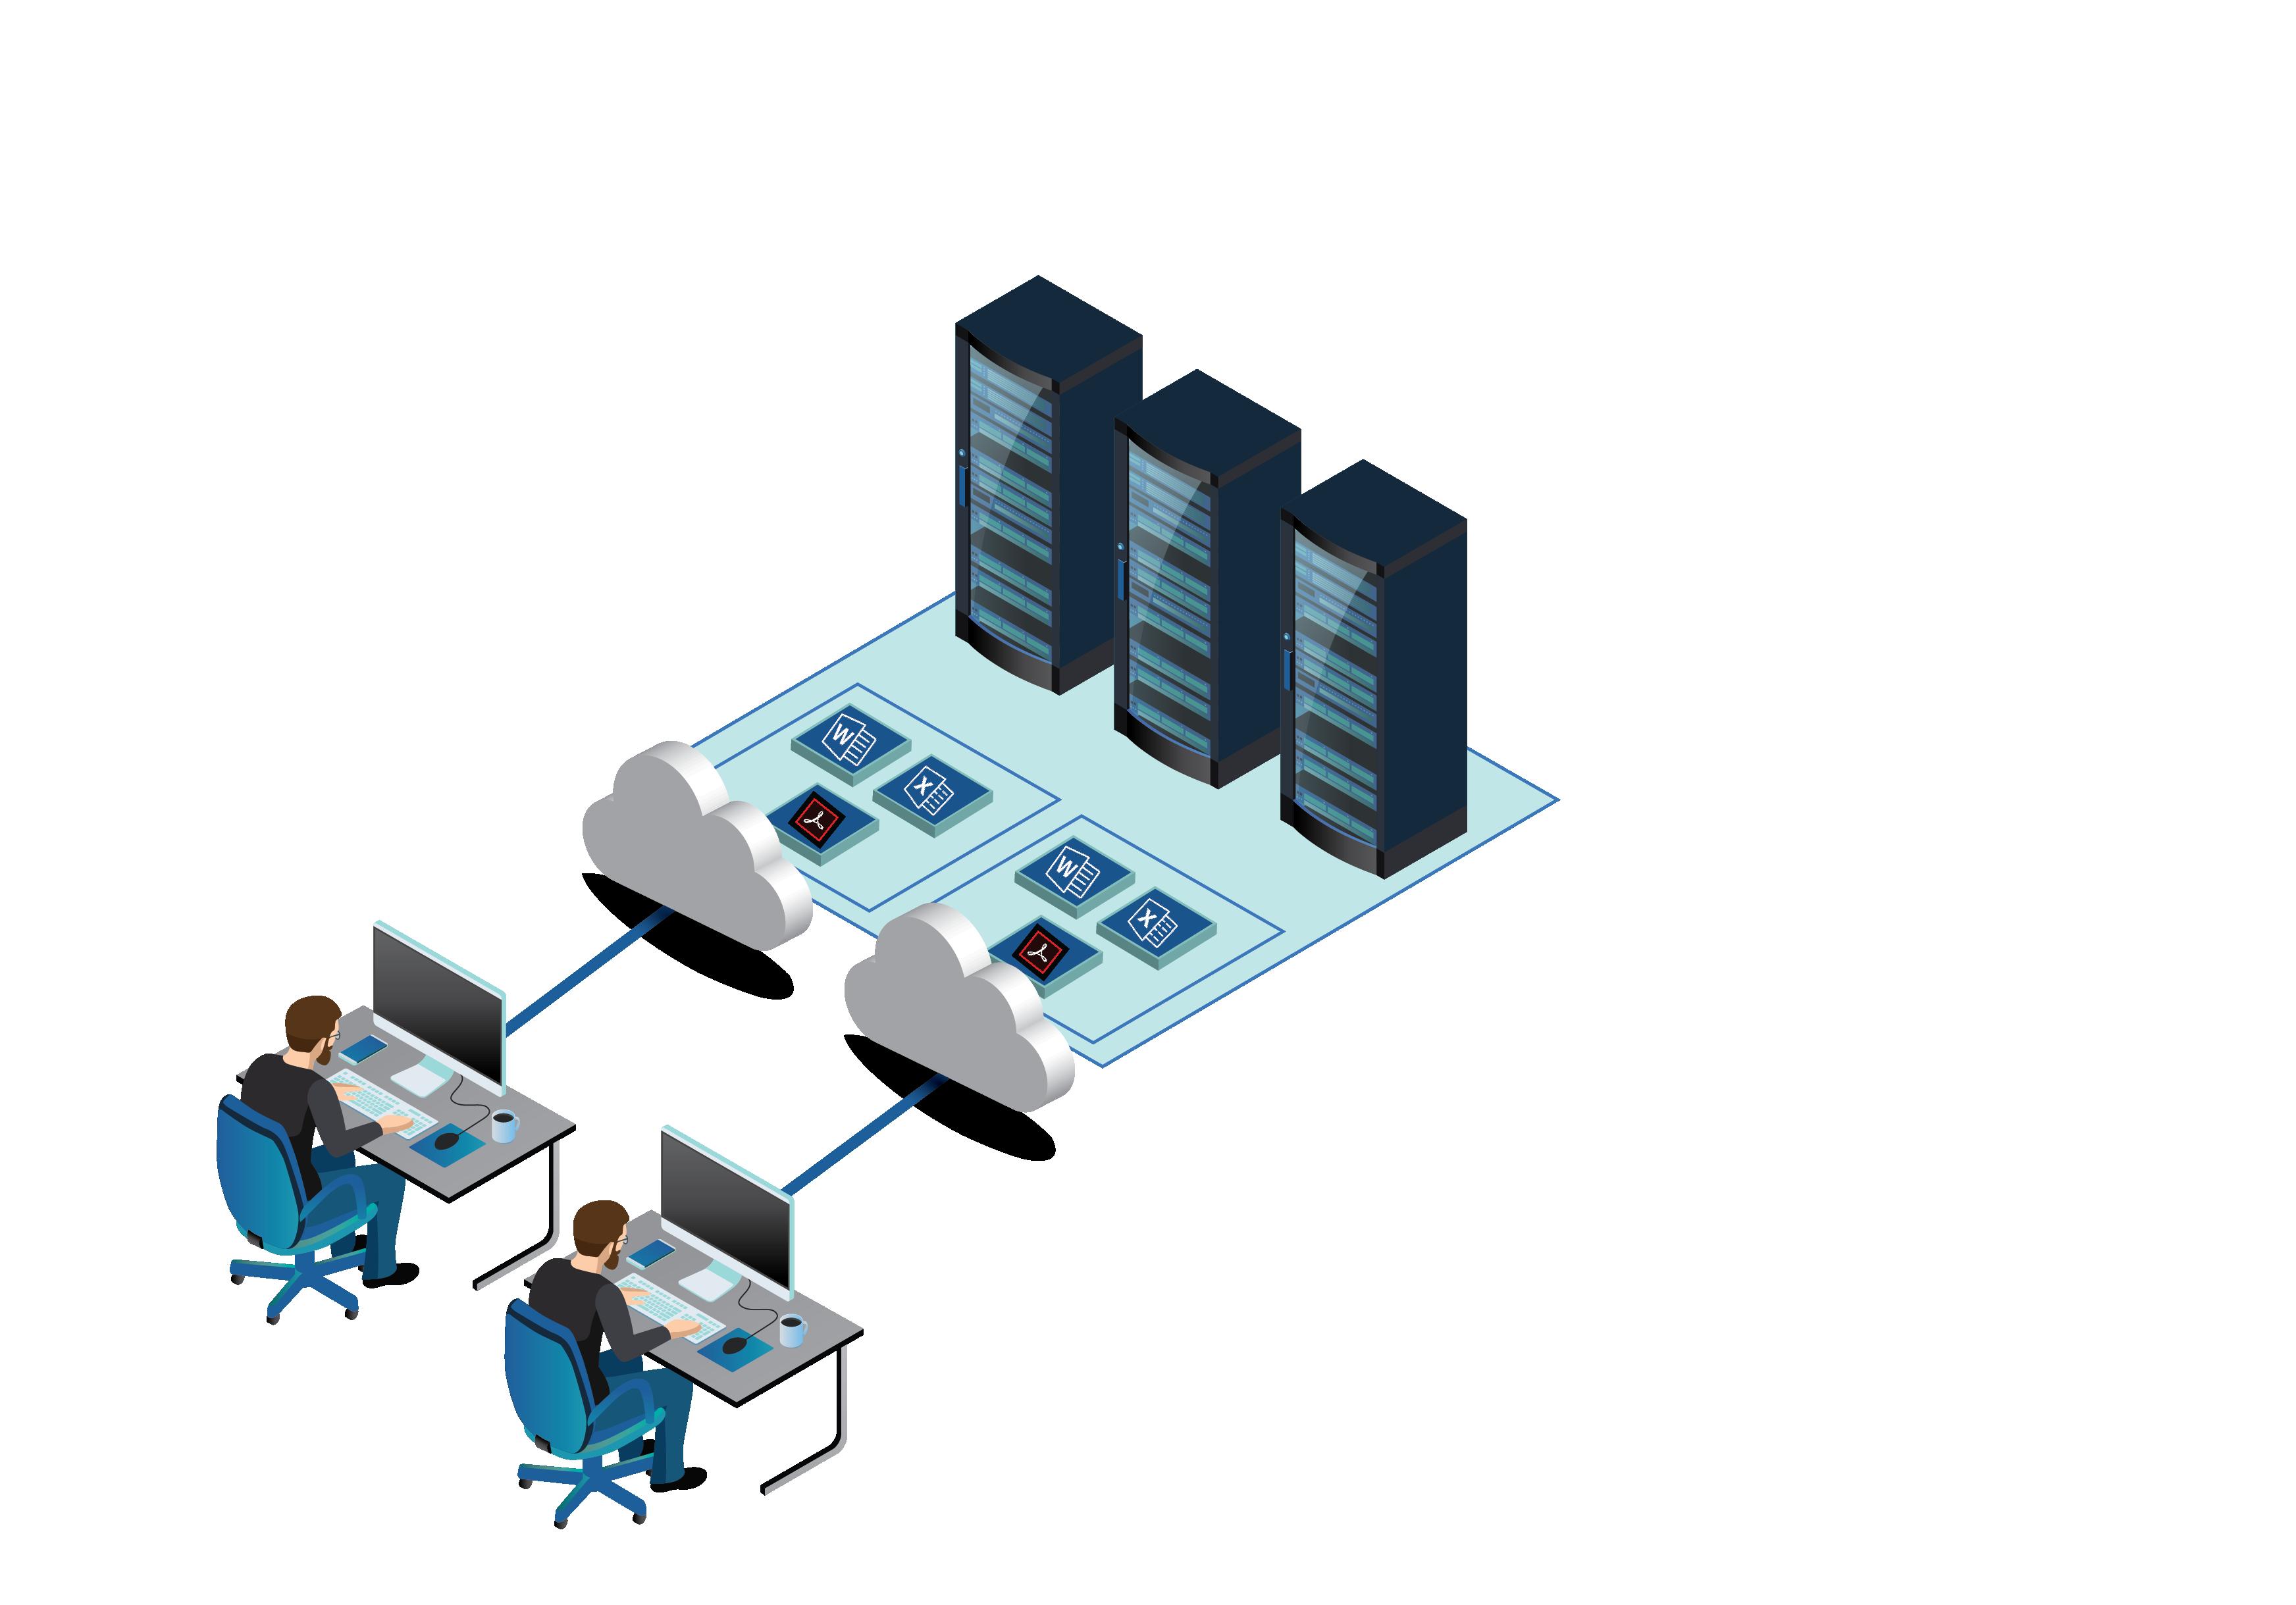 Desktop as a service daas